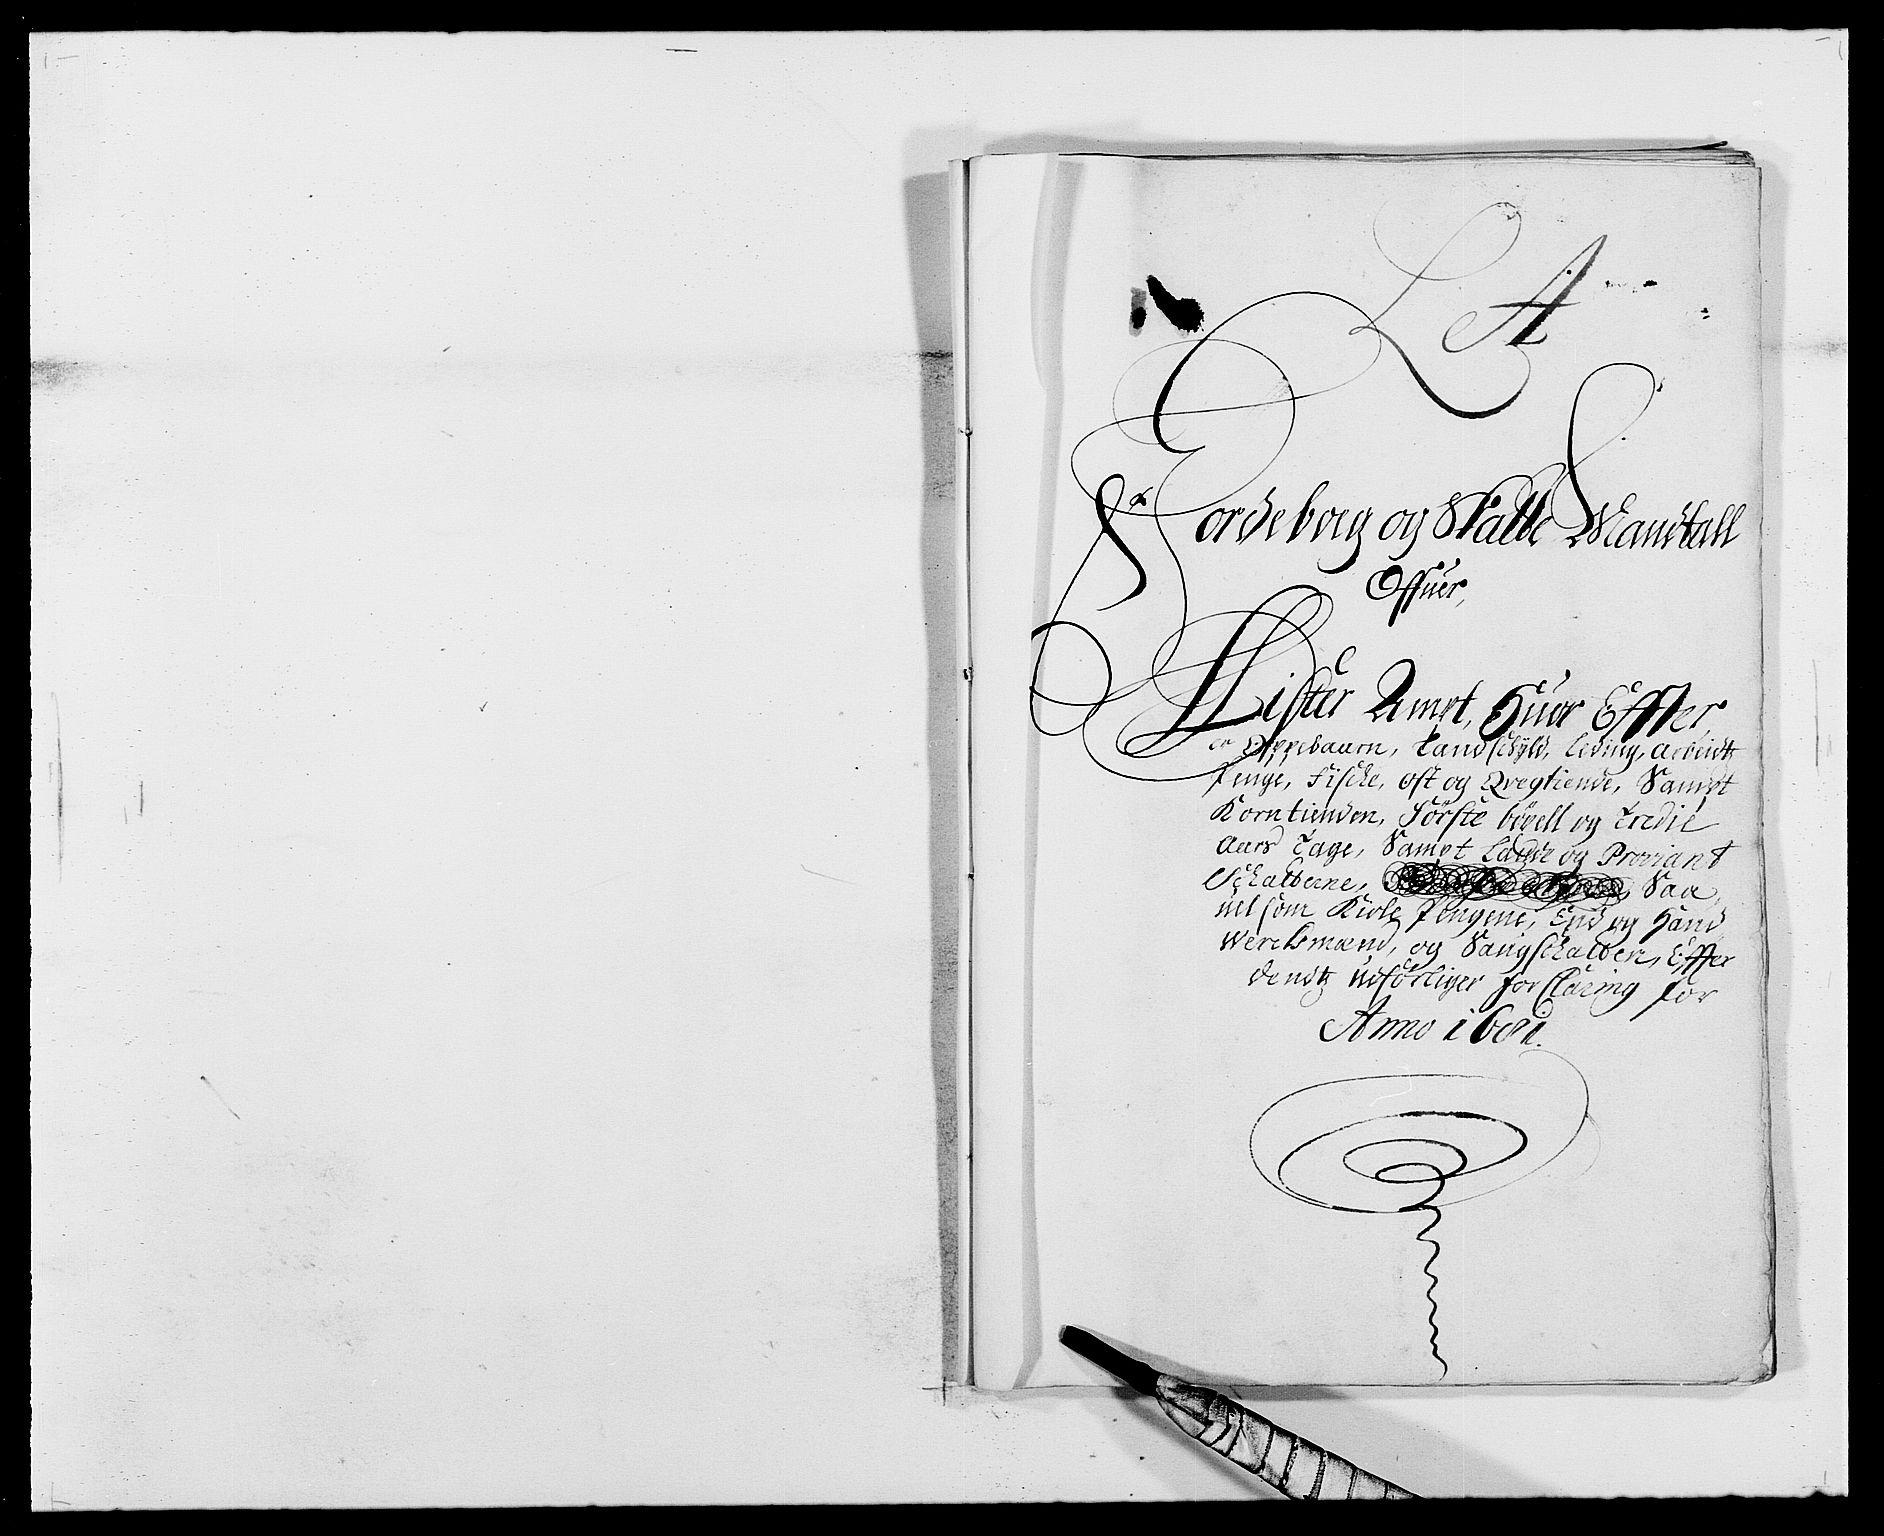 RA, Rentekammeret inntil 1814, Reviderte regnskaper, Fogderegnskap, R41/L2531: Fogderegnskap Lista, 1680-1682, s. 75